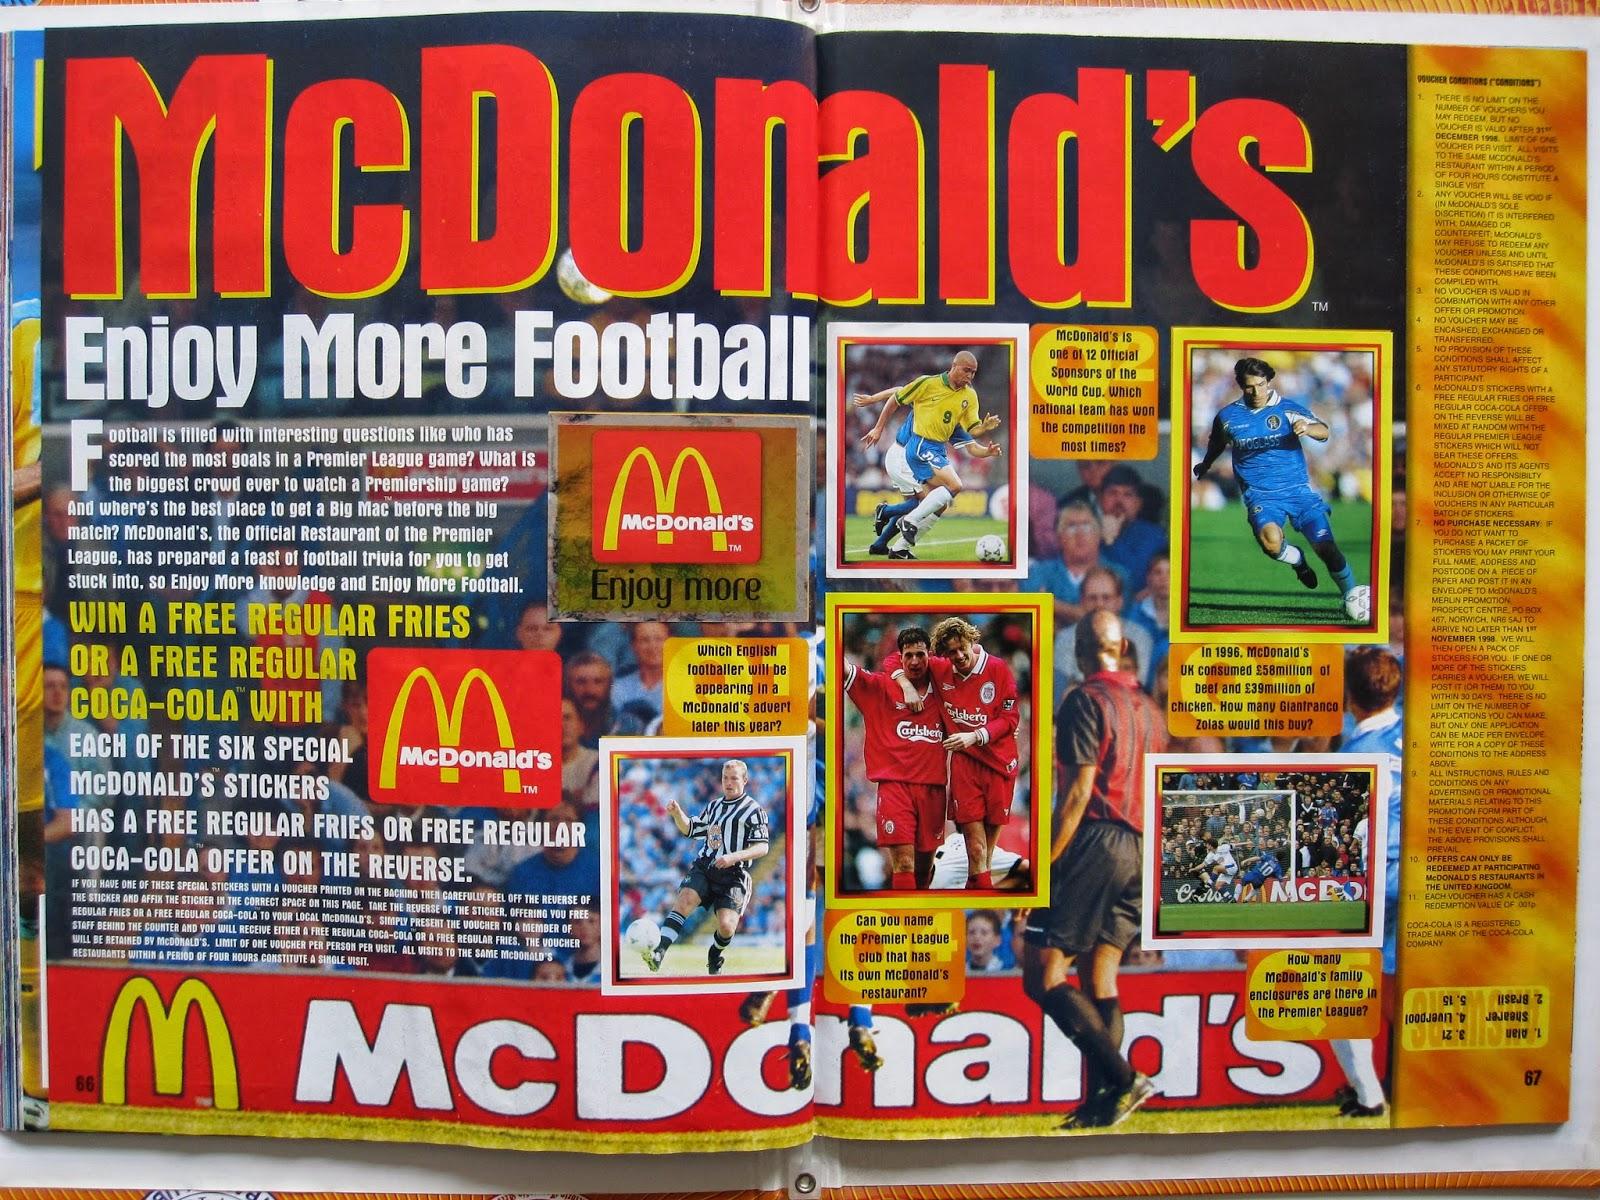 Only Good Stickers: Merlin's Premier League 98